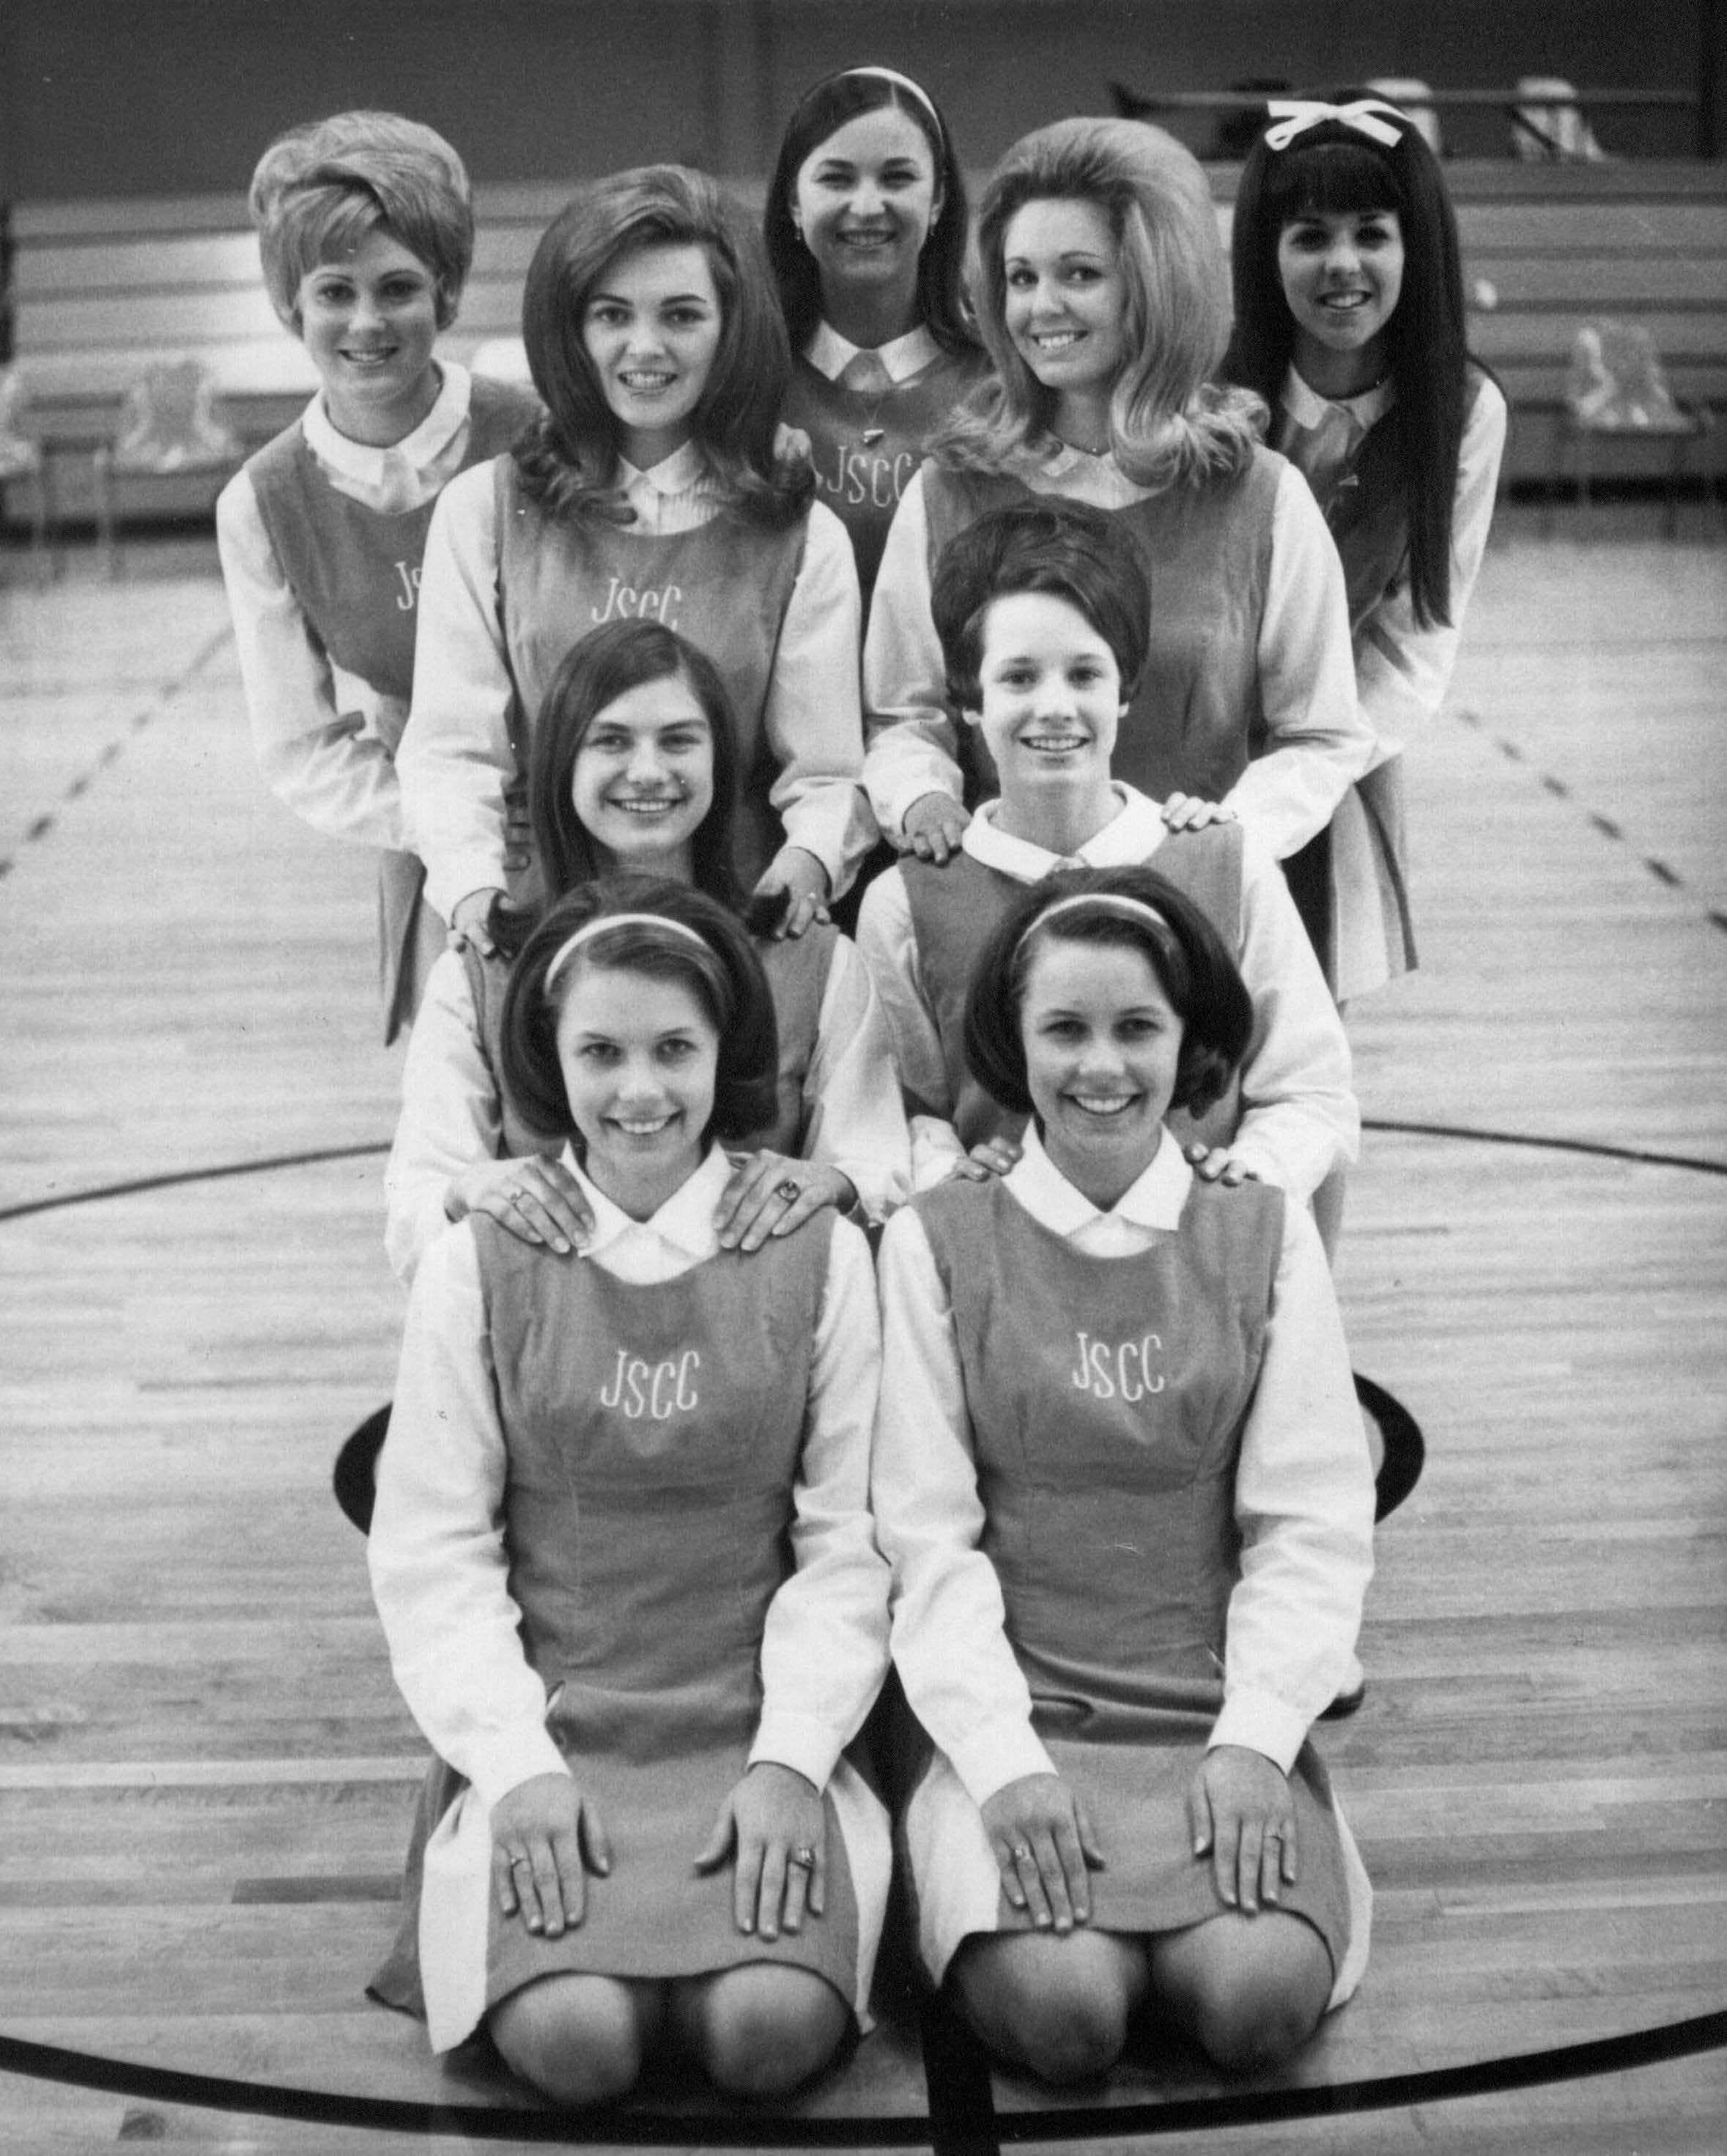 Cheerleaders, 1960s